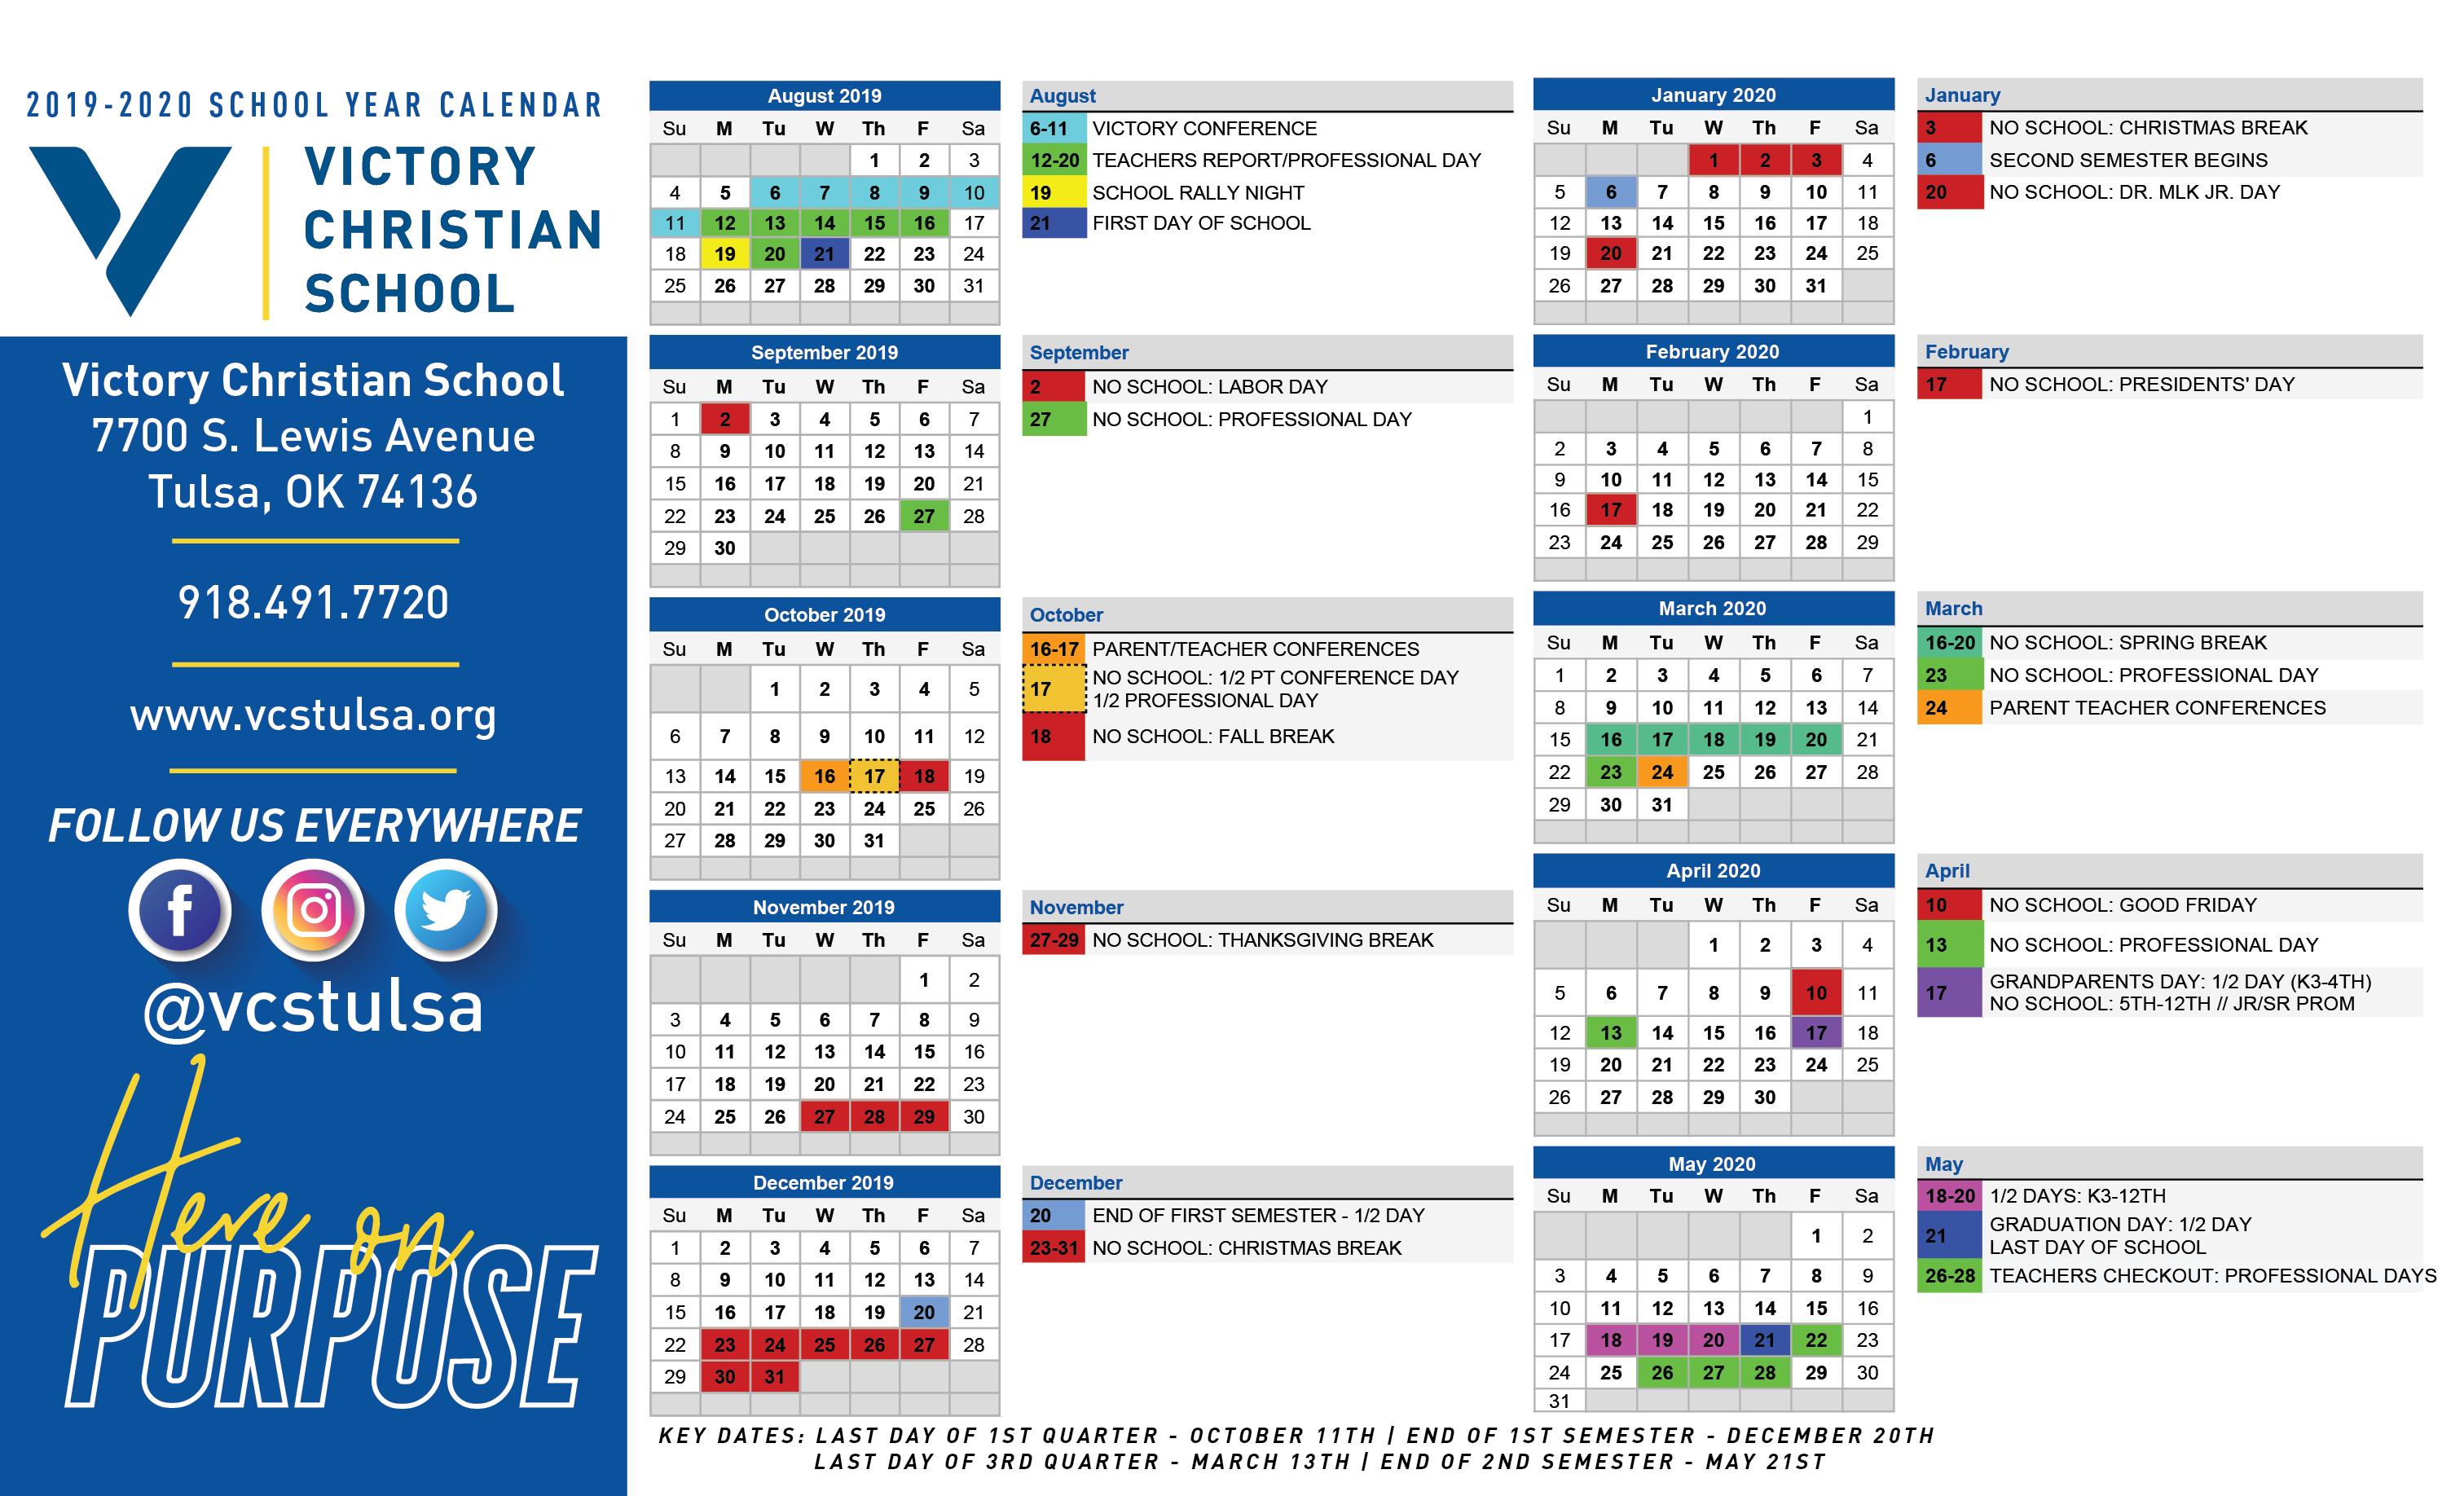 University Of Tulsa 2021 Calendar   Printable Calendar Intended For University Of Ri Academic Calendar 2021 2020